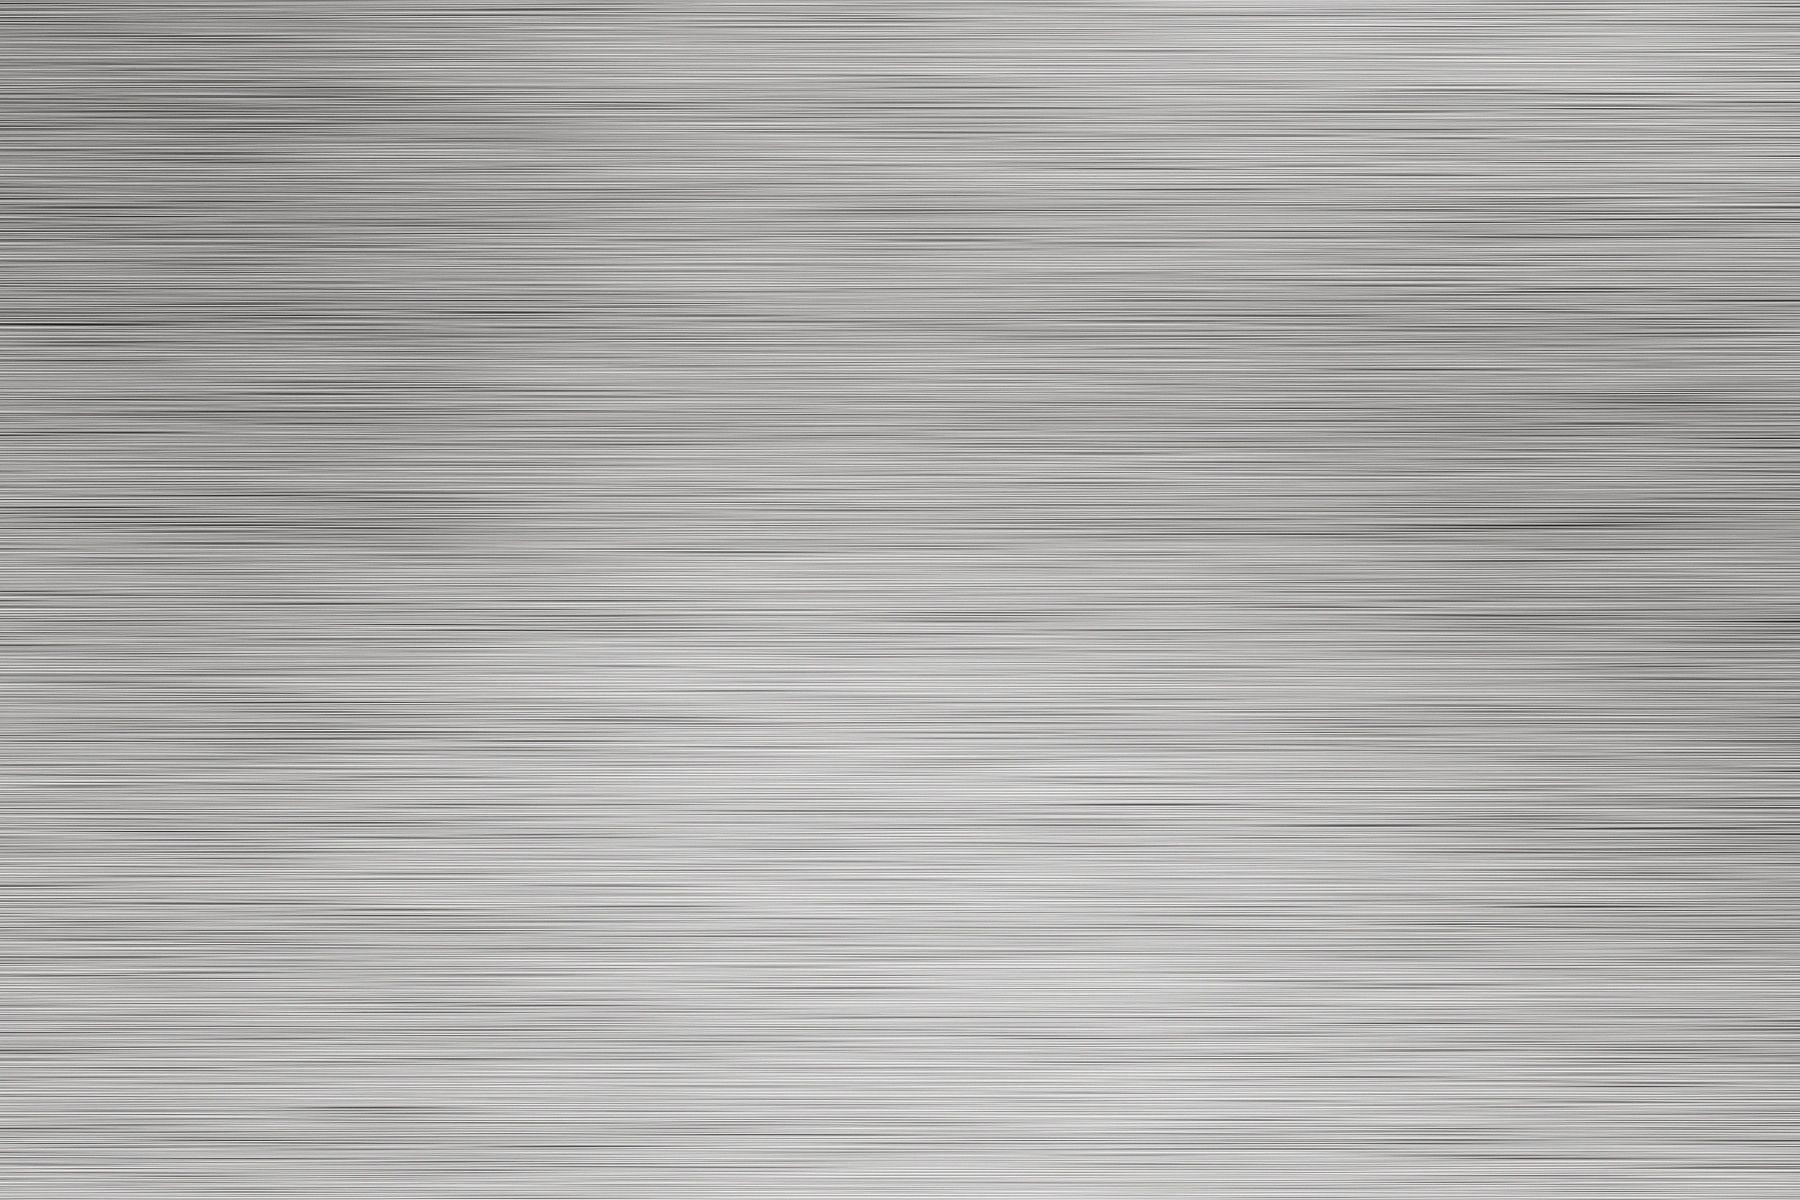 Silver Desktop Background